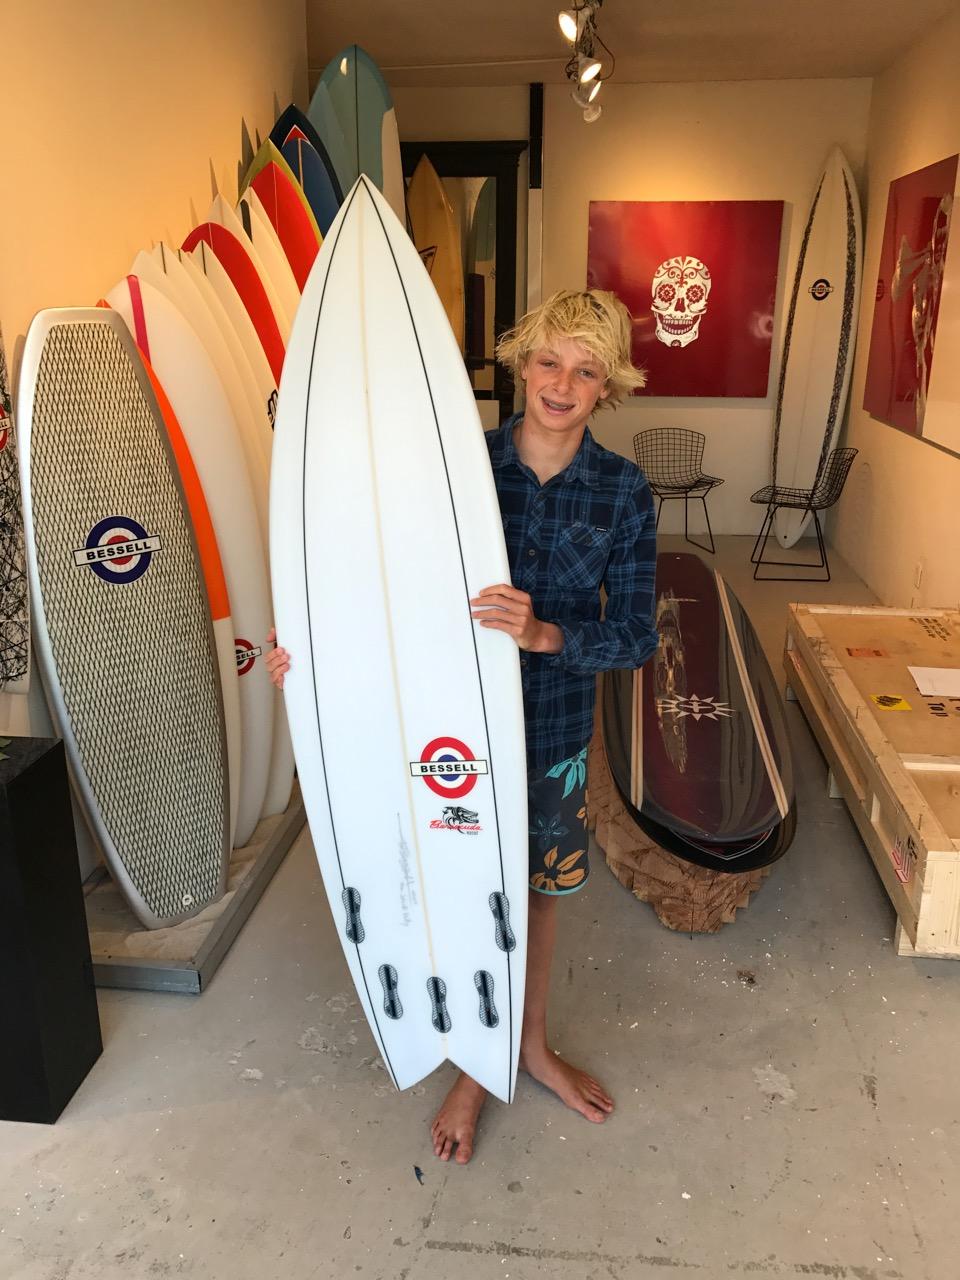 jacob kelly_Bessell custom surfboards